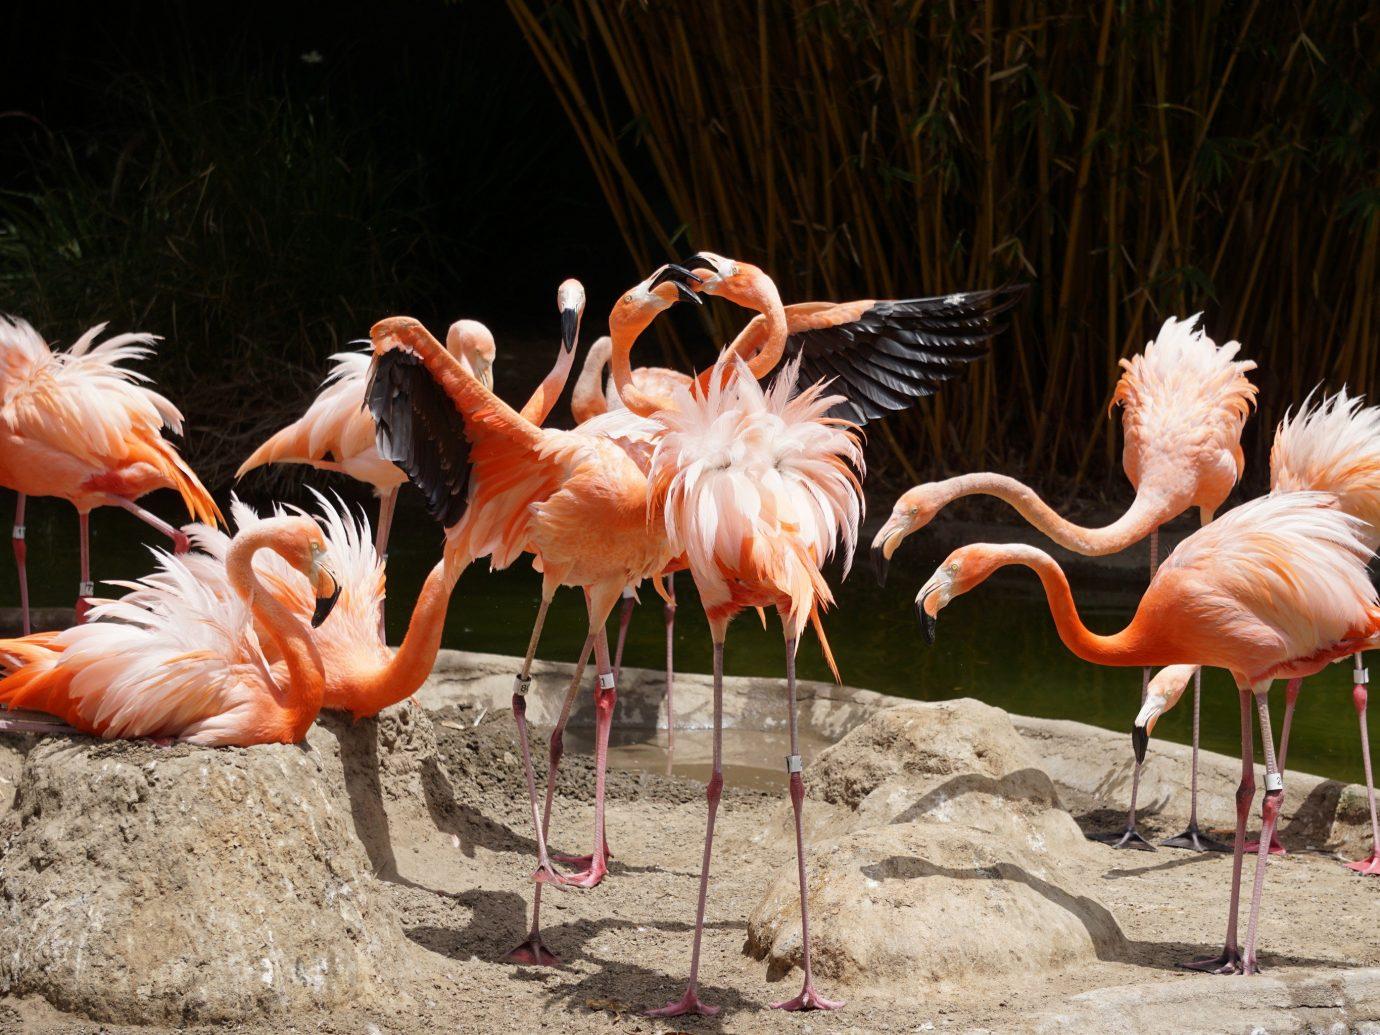 Family Travel Trip Ideas Weekend Getaways Bird flamingo outdoor animal aquatic bird ground flock vertebrate standing group beak fauna water bird zoo colored